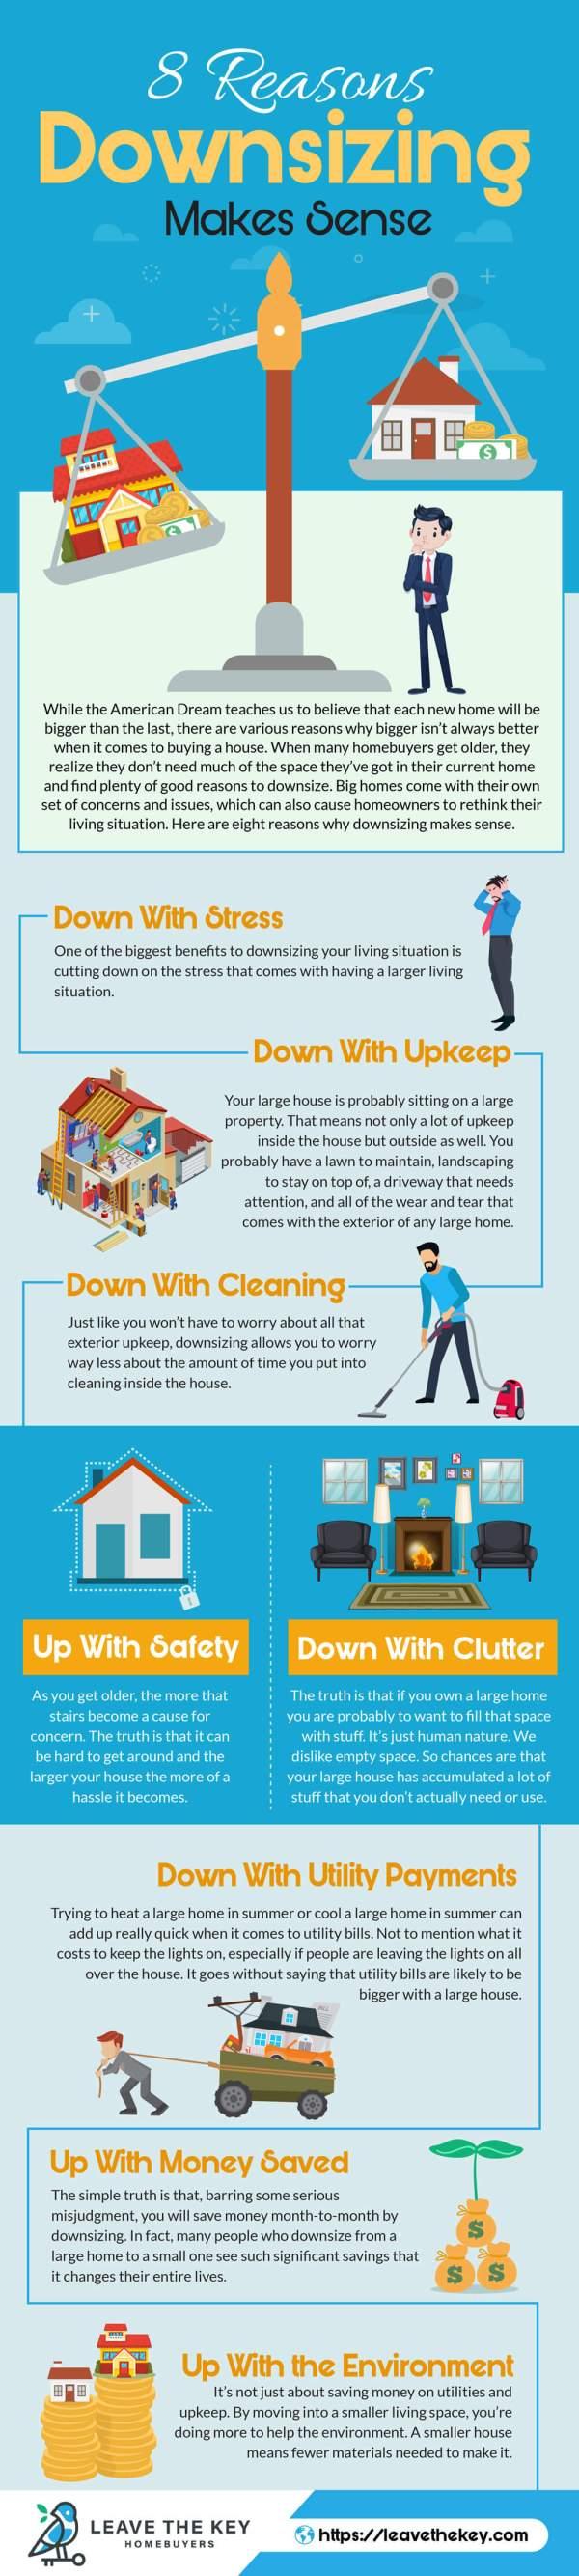 8-Reasons-Downsizing-Makes-Sense-infographic-lkrllc